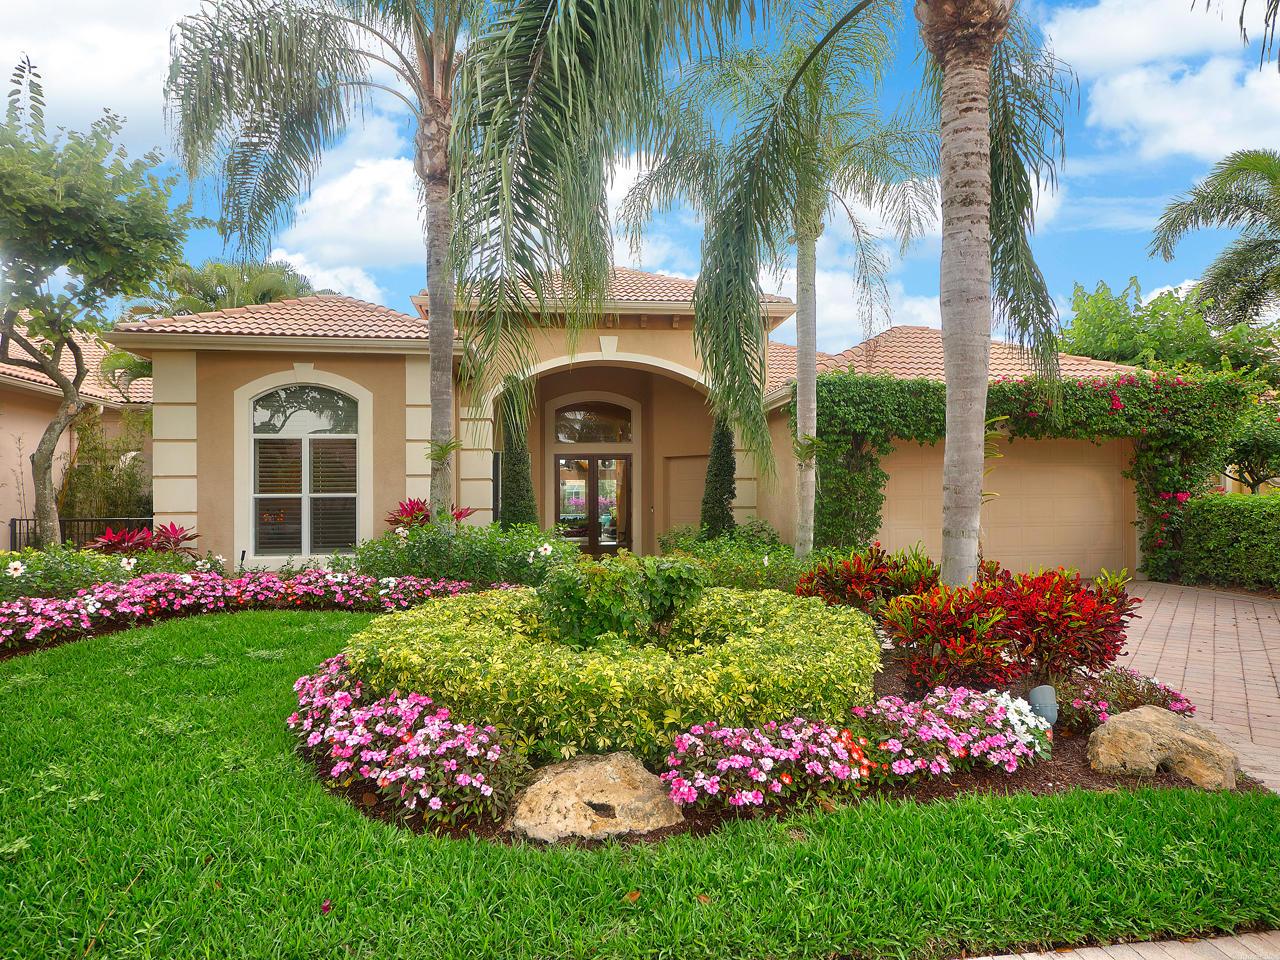 Photo of 120 Vintage Isle, Palm Beach Gardens, FL 33418